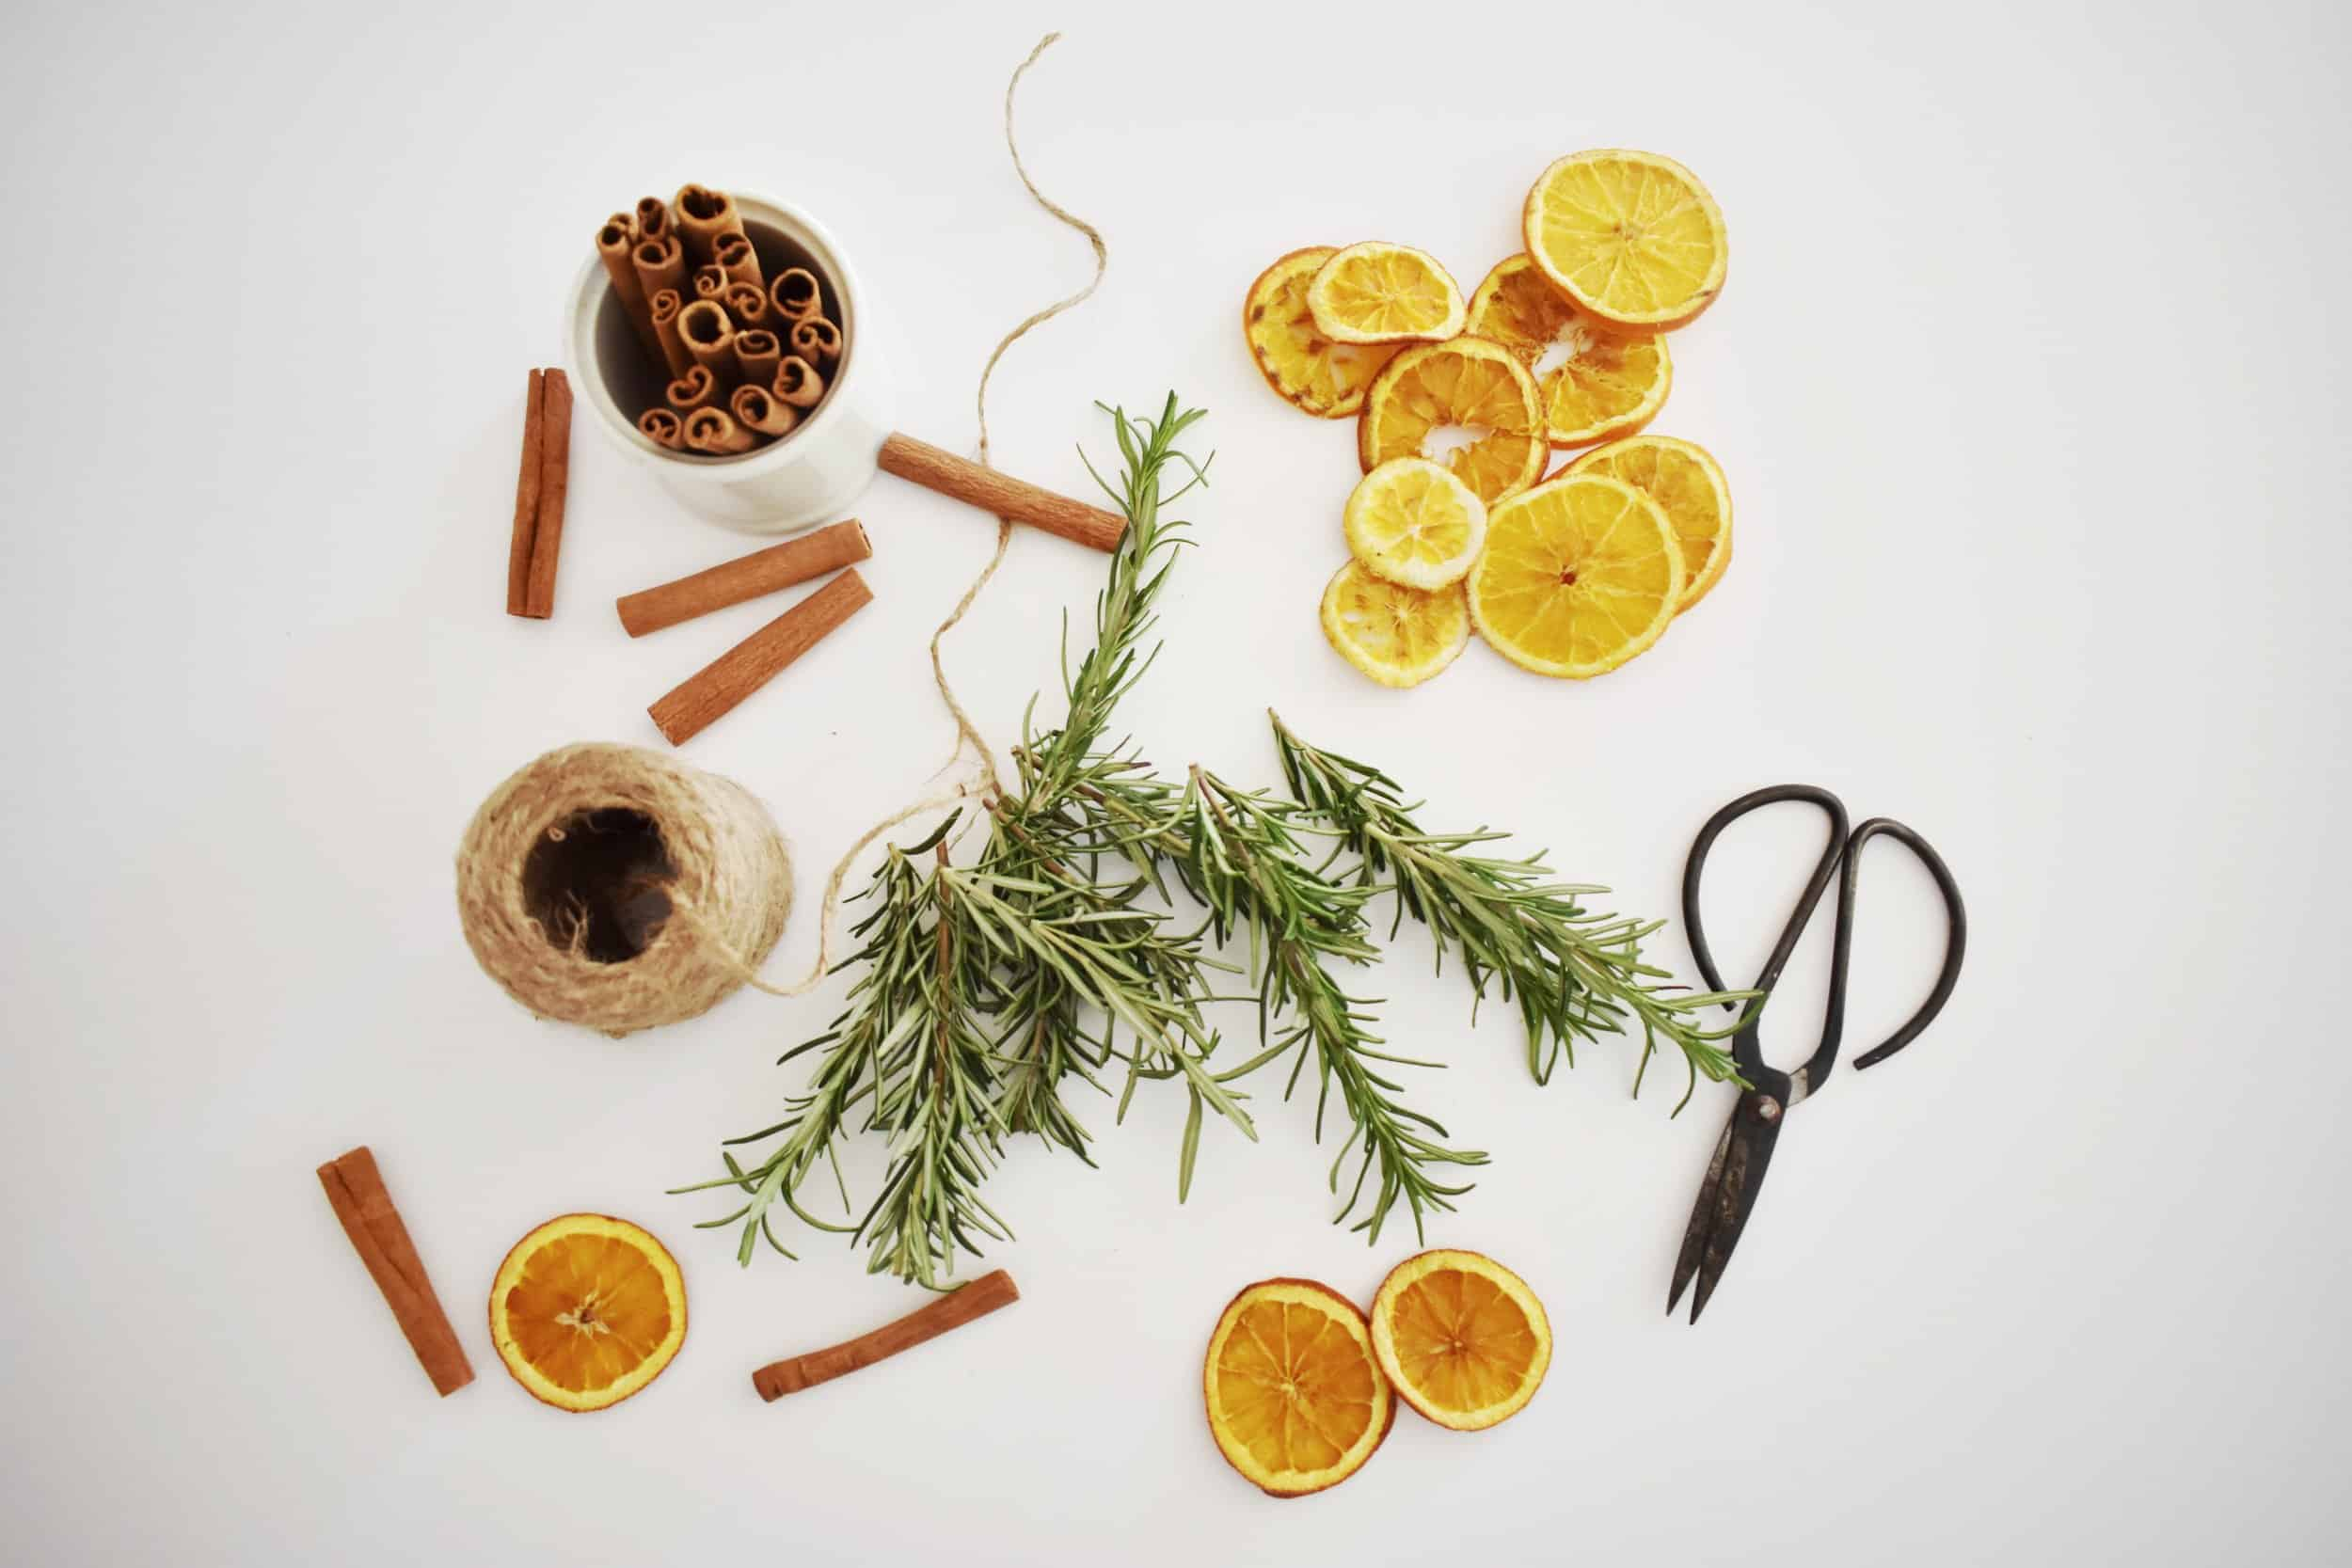 How to Make a DIY Simple Dried Orange Garland   Rocky Hedge Farm